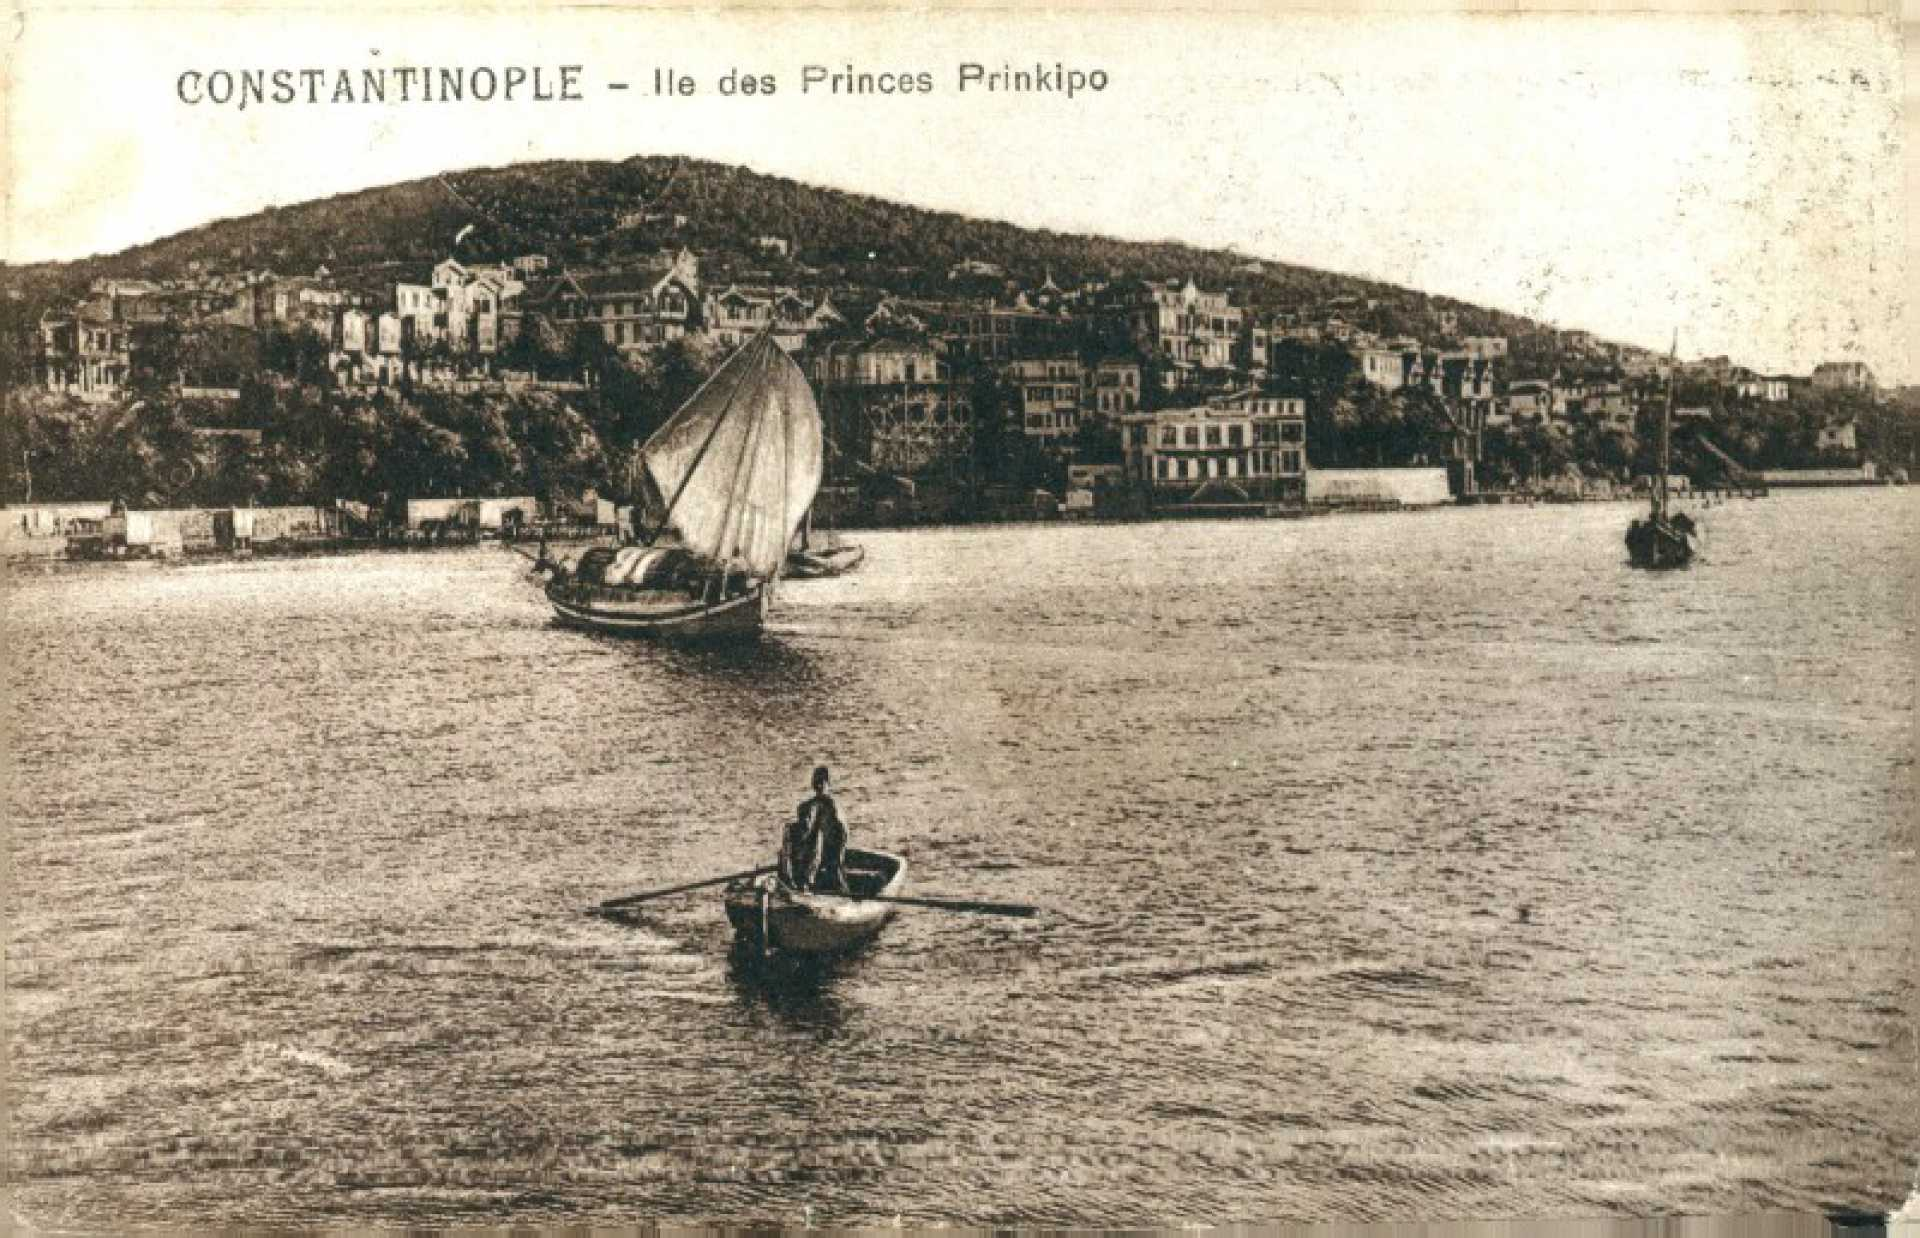 İle des Princes Prinkipo